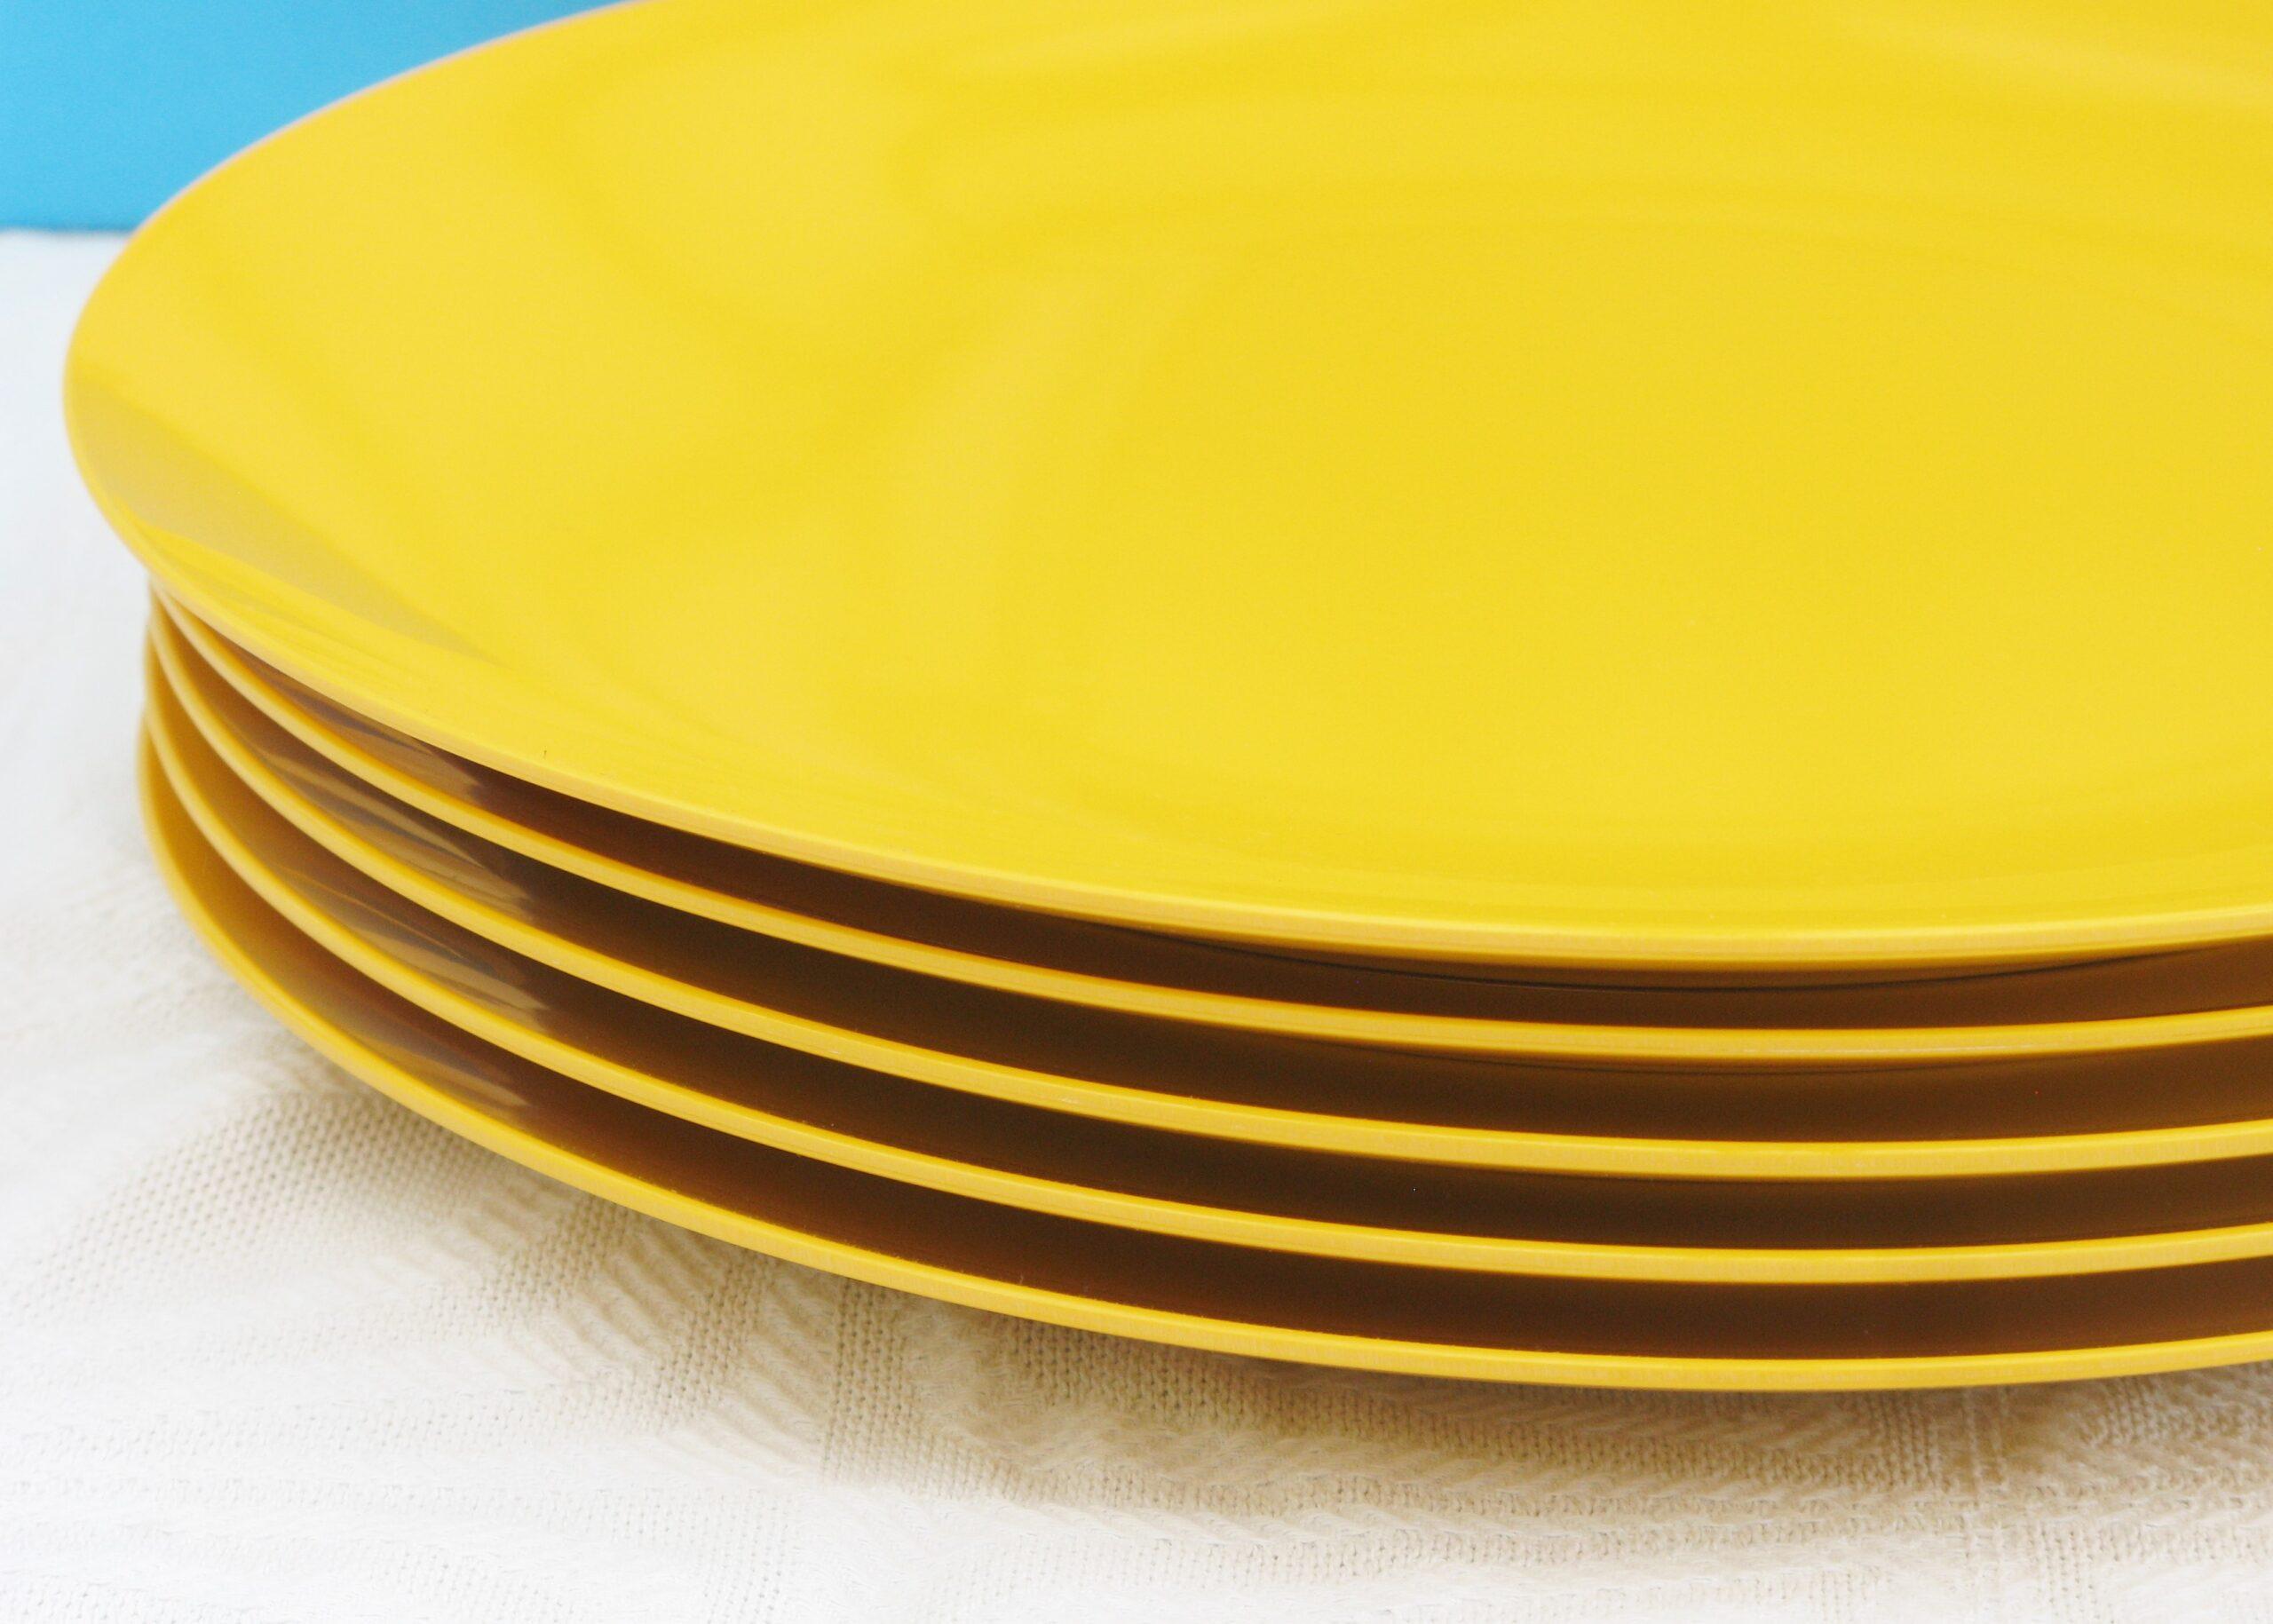 Vintage Retro Melaware Dinner Plates Set Of 6 Yellow 70s 80s Rachel S Vintage Retro